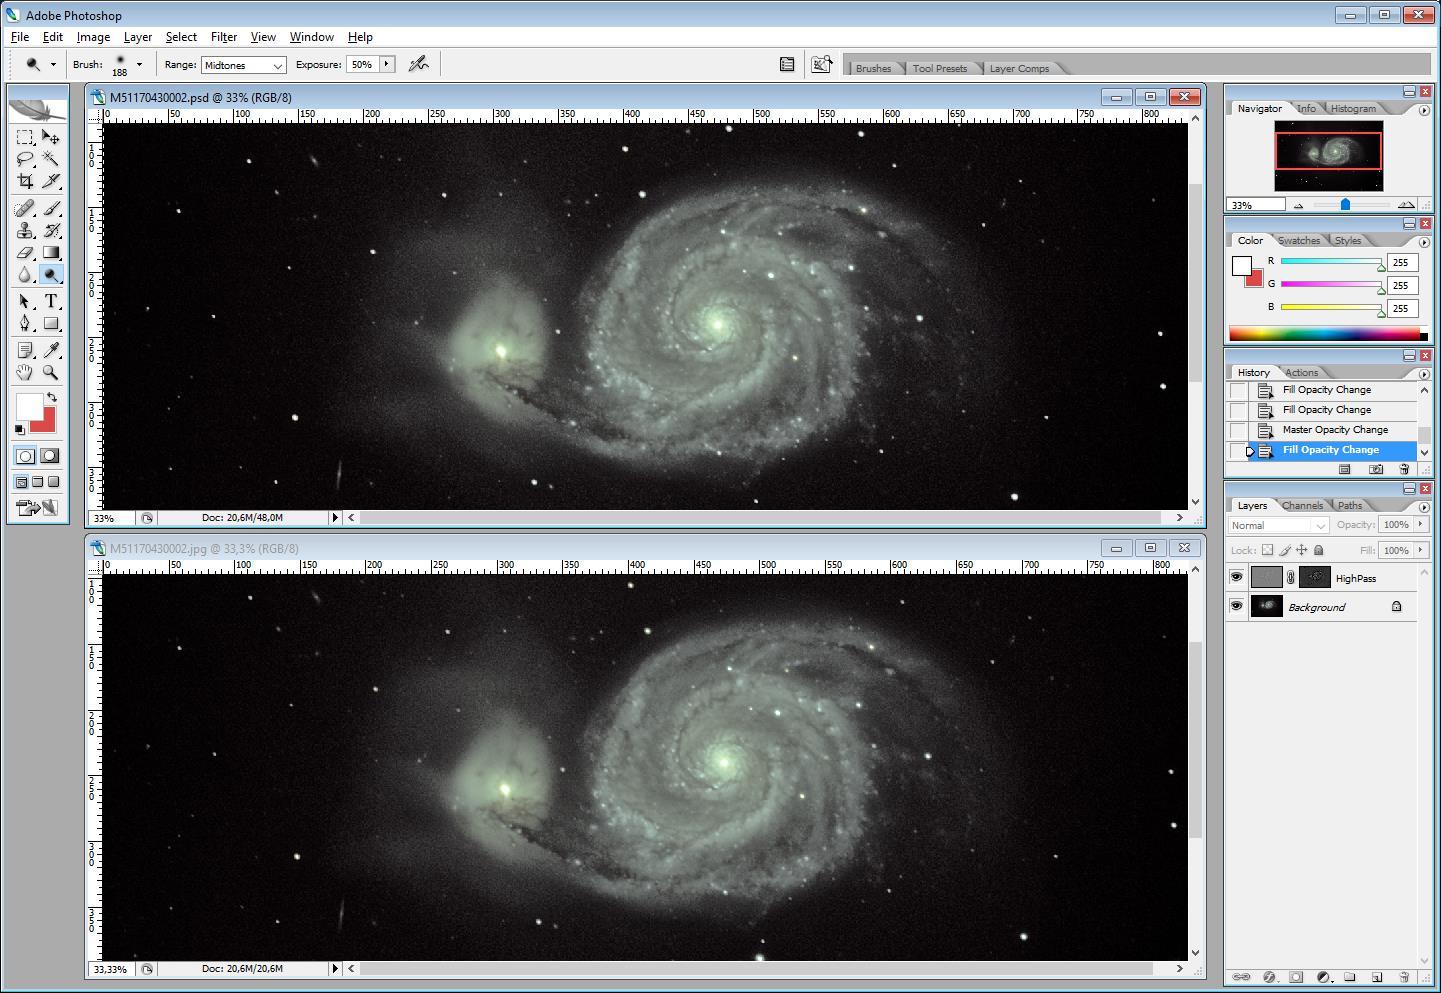 ImageProcessing : Technique HighPass 610